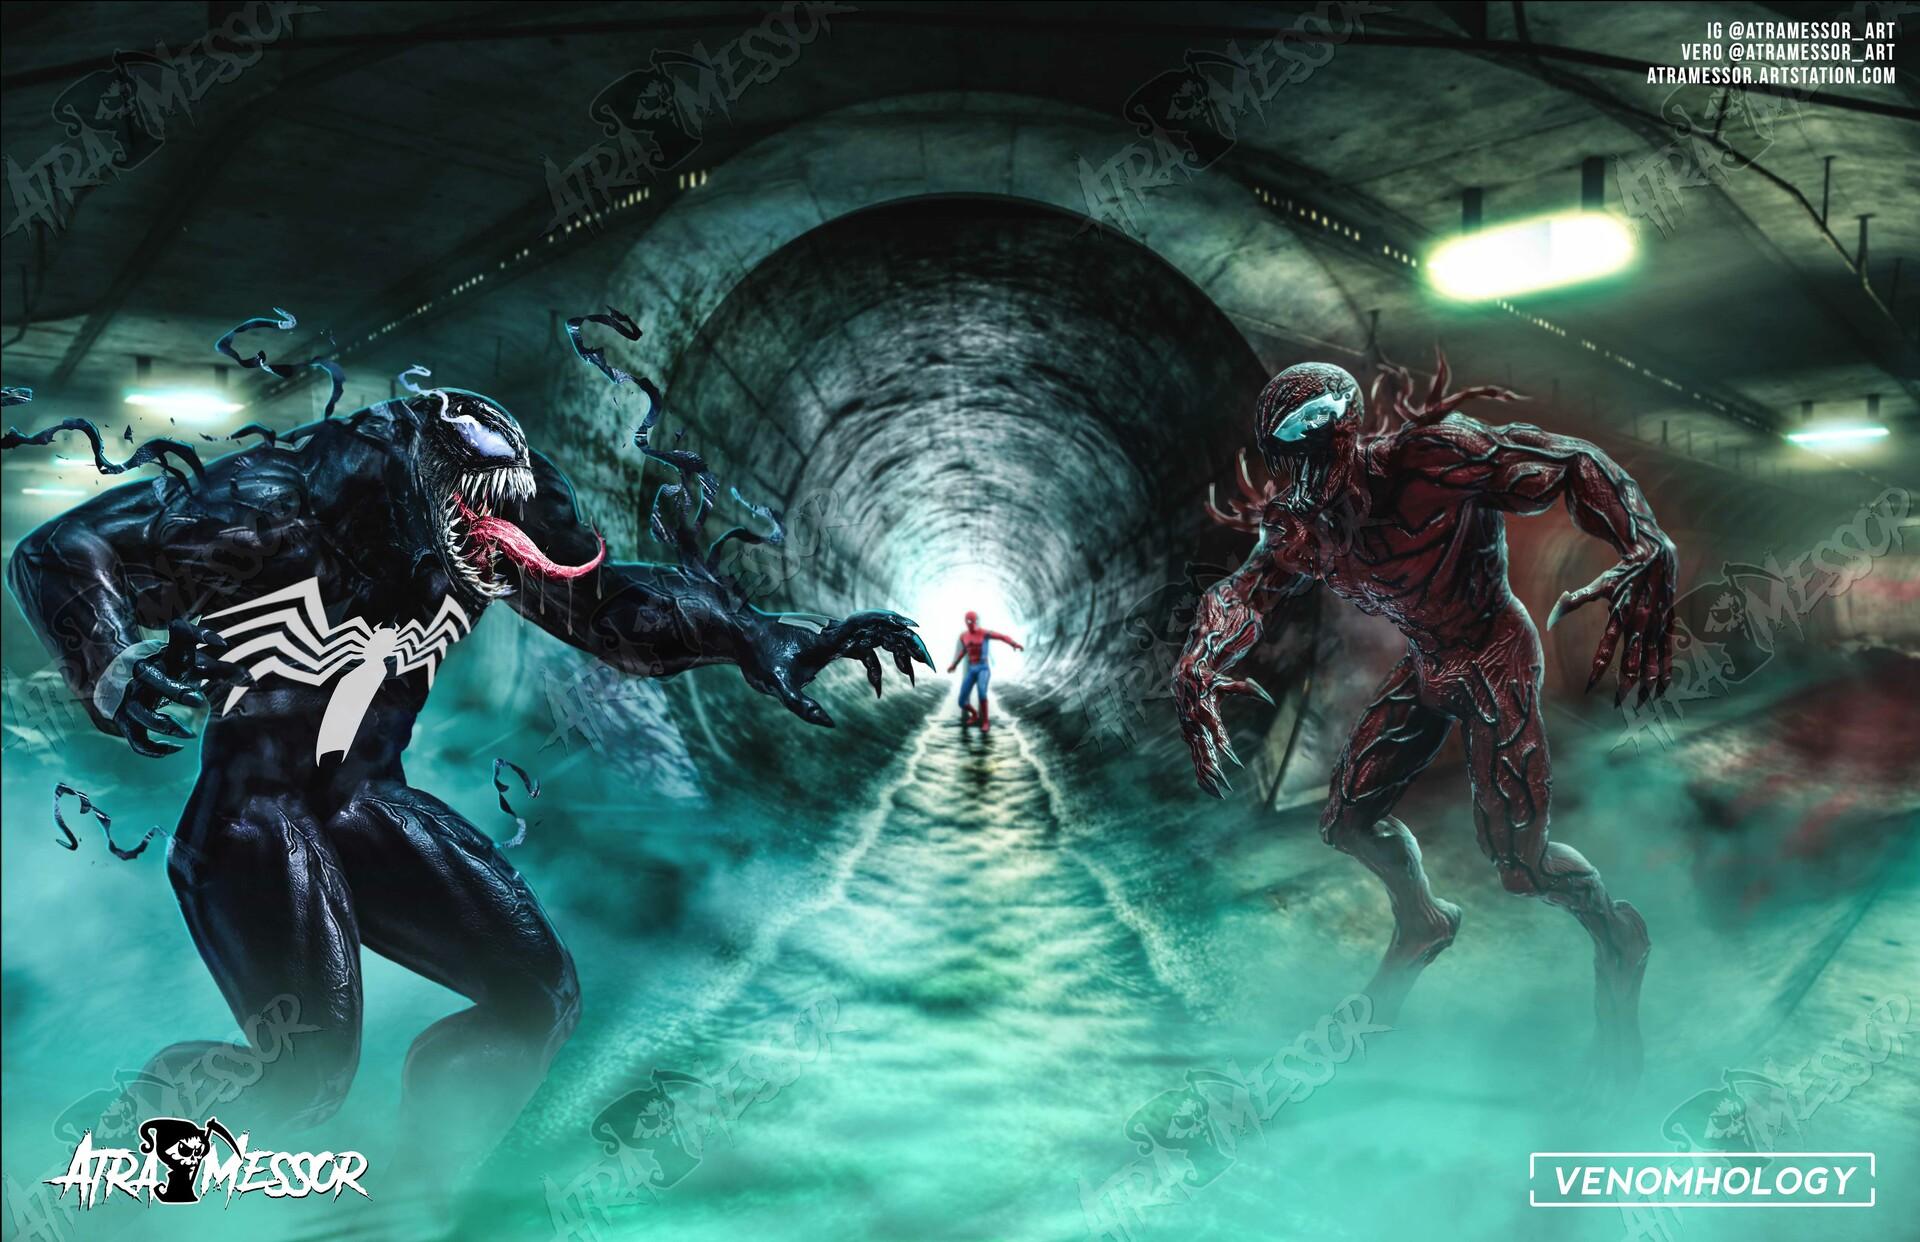 Venom vs Carnage (collab with Venomhology)